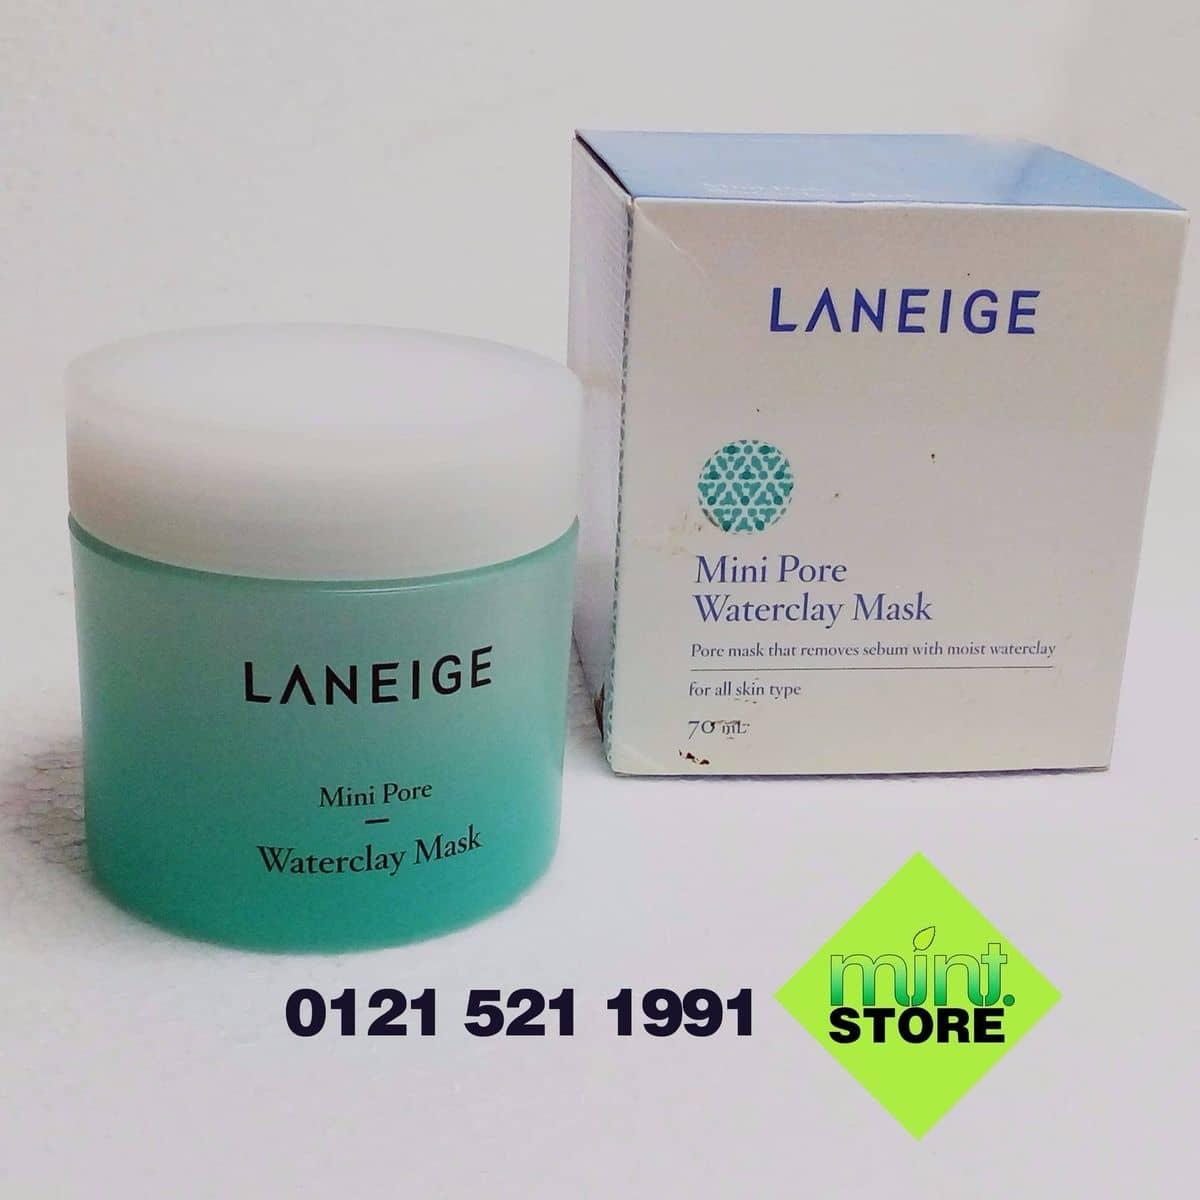 Mt N T St Mini Pore Water Clay Mask 70ml Set 4 Dng M Laneige Wateclay Ti Hi Phng Ca Mintstore Lozi